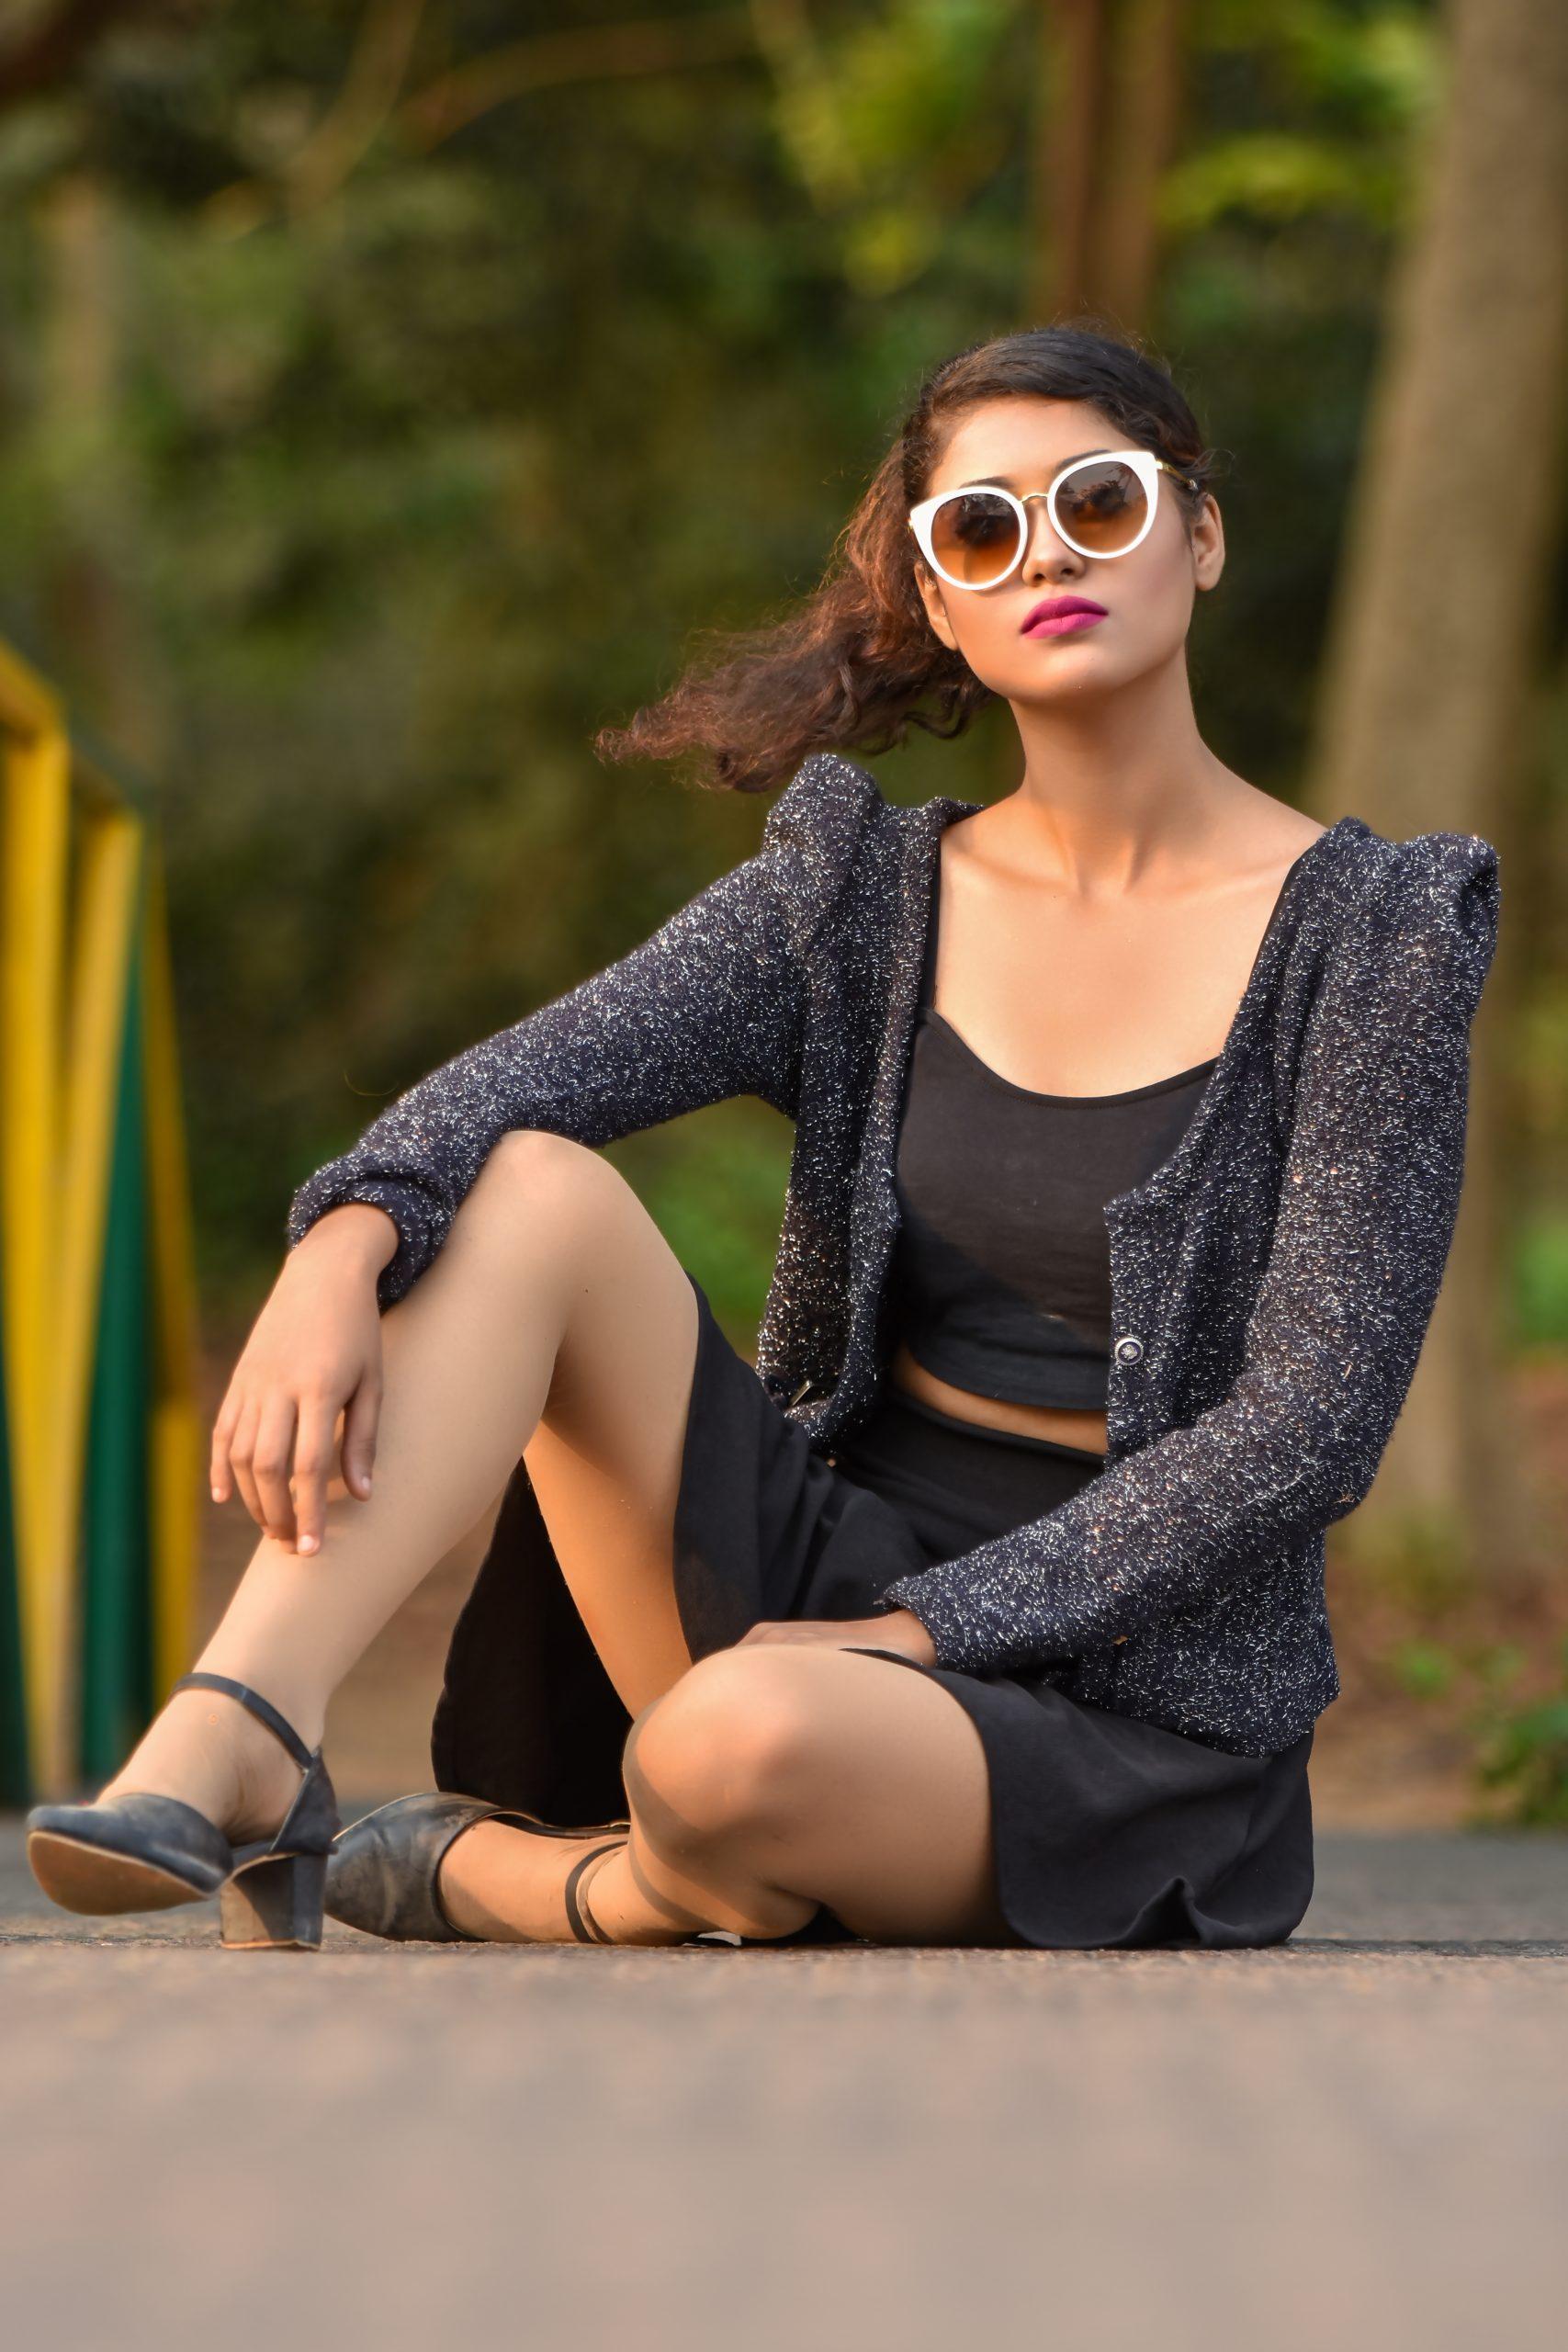 Female model posing on the road